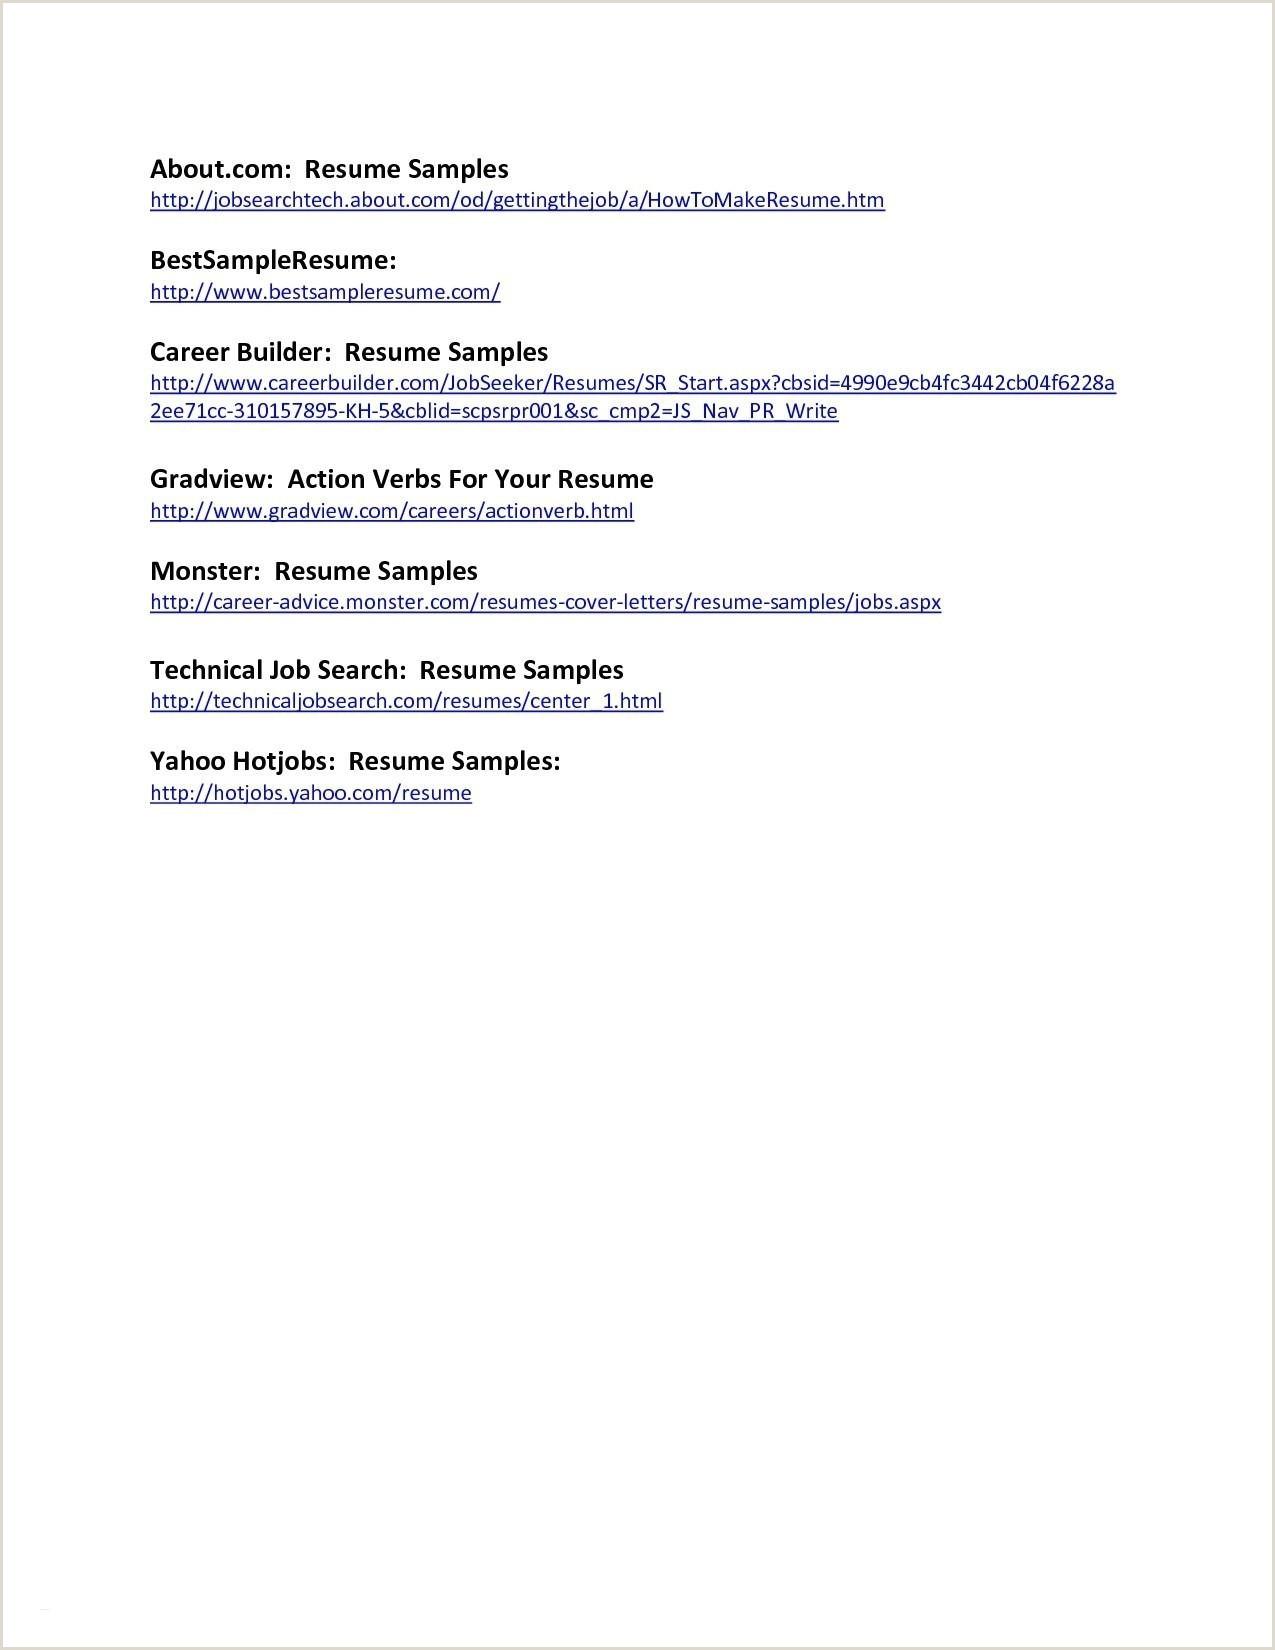 Dj Invoice Template Word Modele Facture Word Gratuit New Modele Devis Word Frais 38